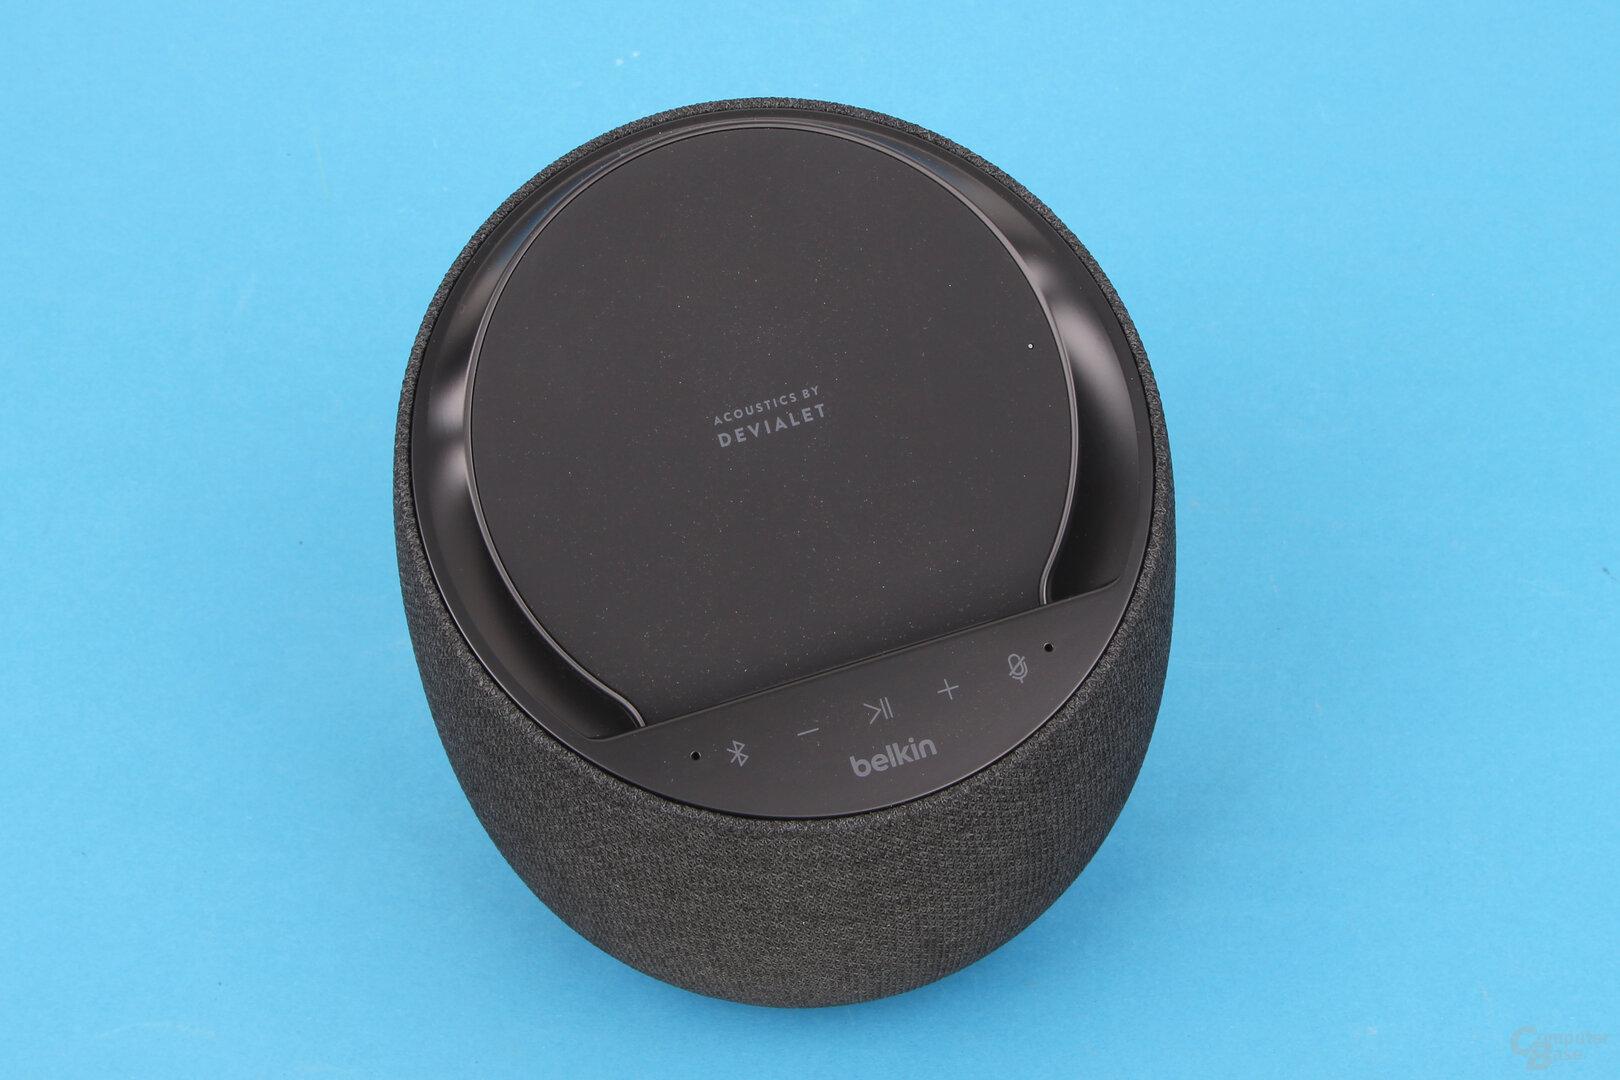 Belkin Soundform Elite Smart Speaker